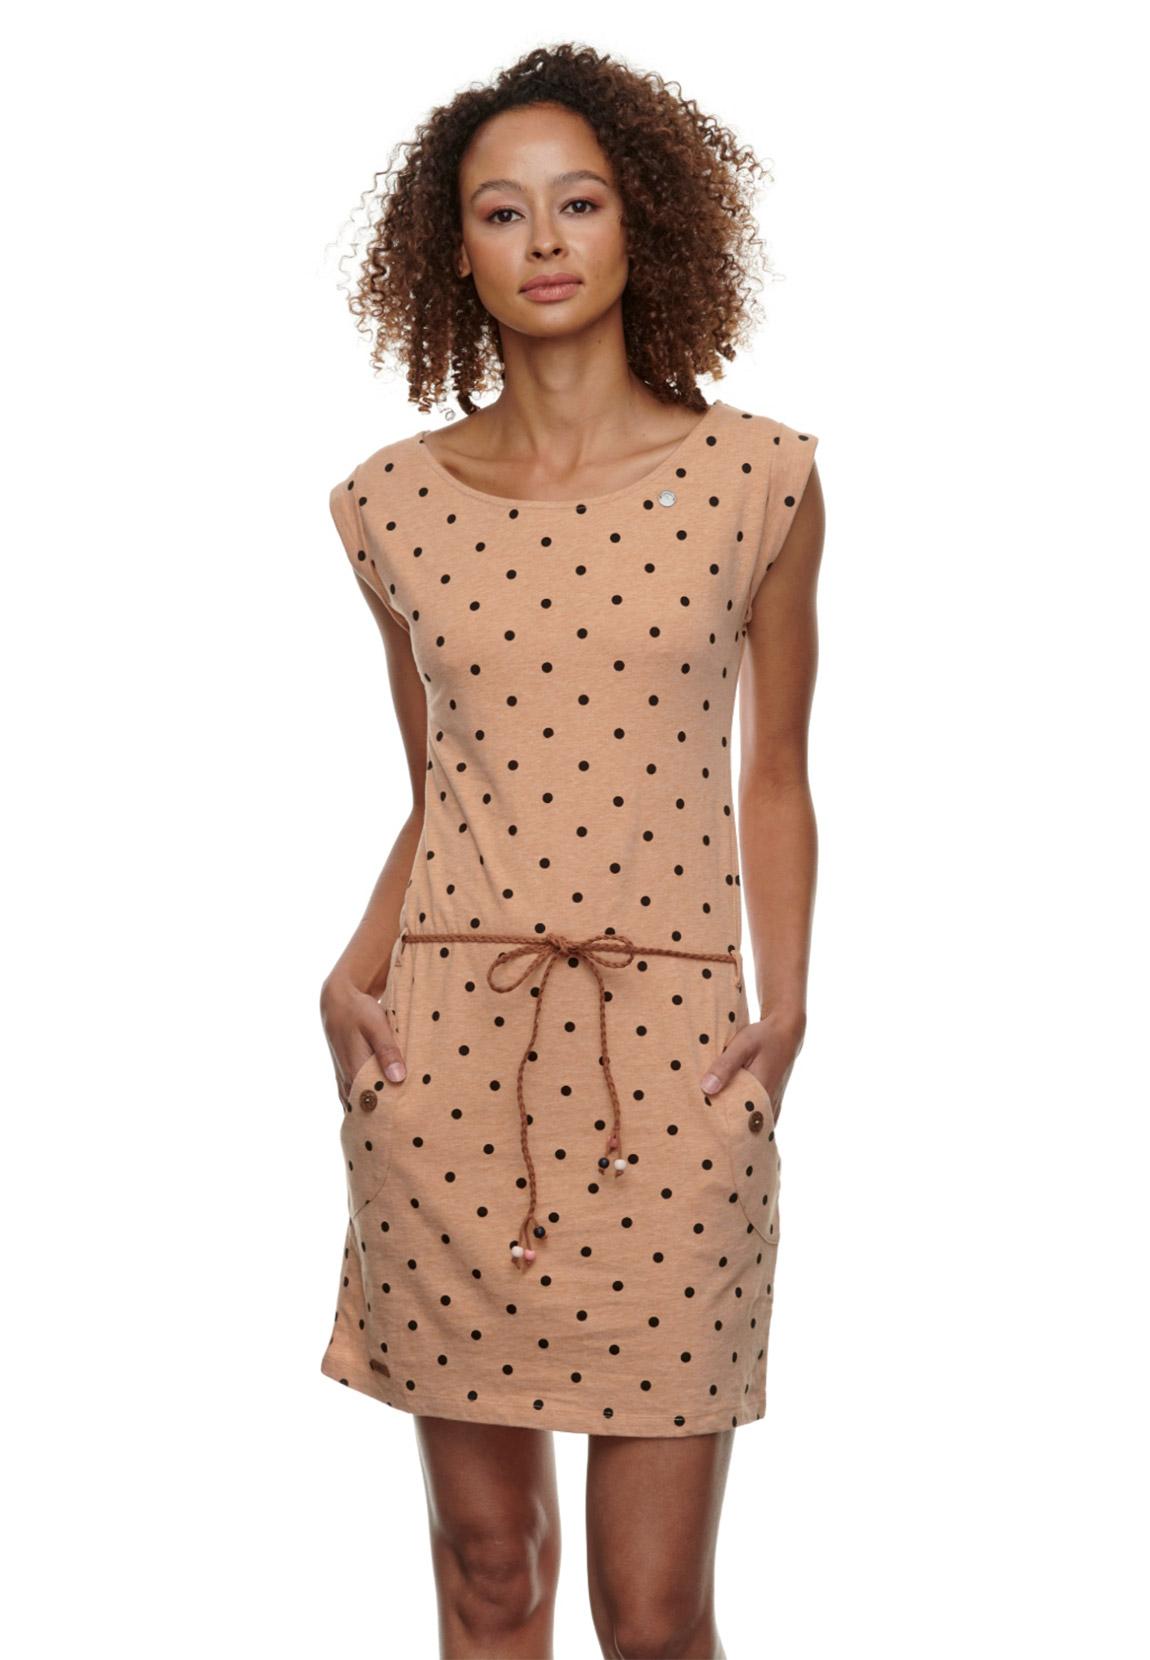 ragwear kleid damen tag dots 2111-20015 beige 6000 beige | fashioncode.de  onlineshop